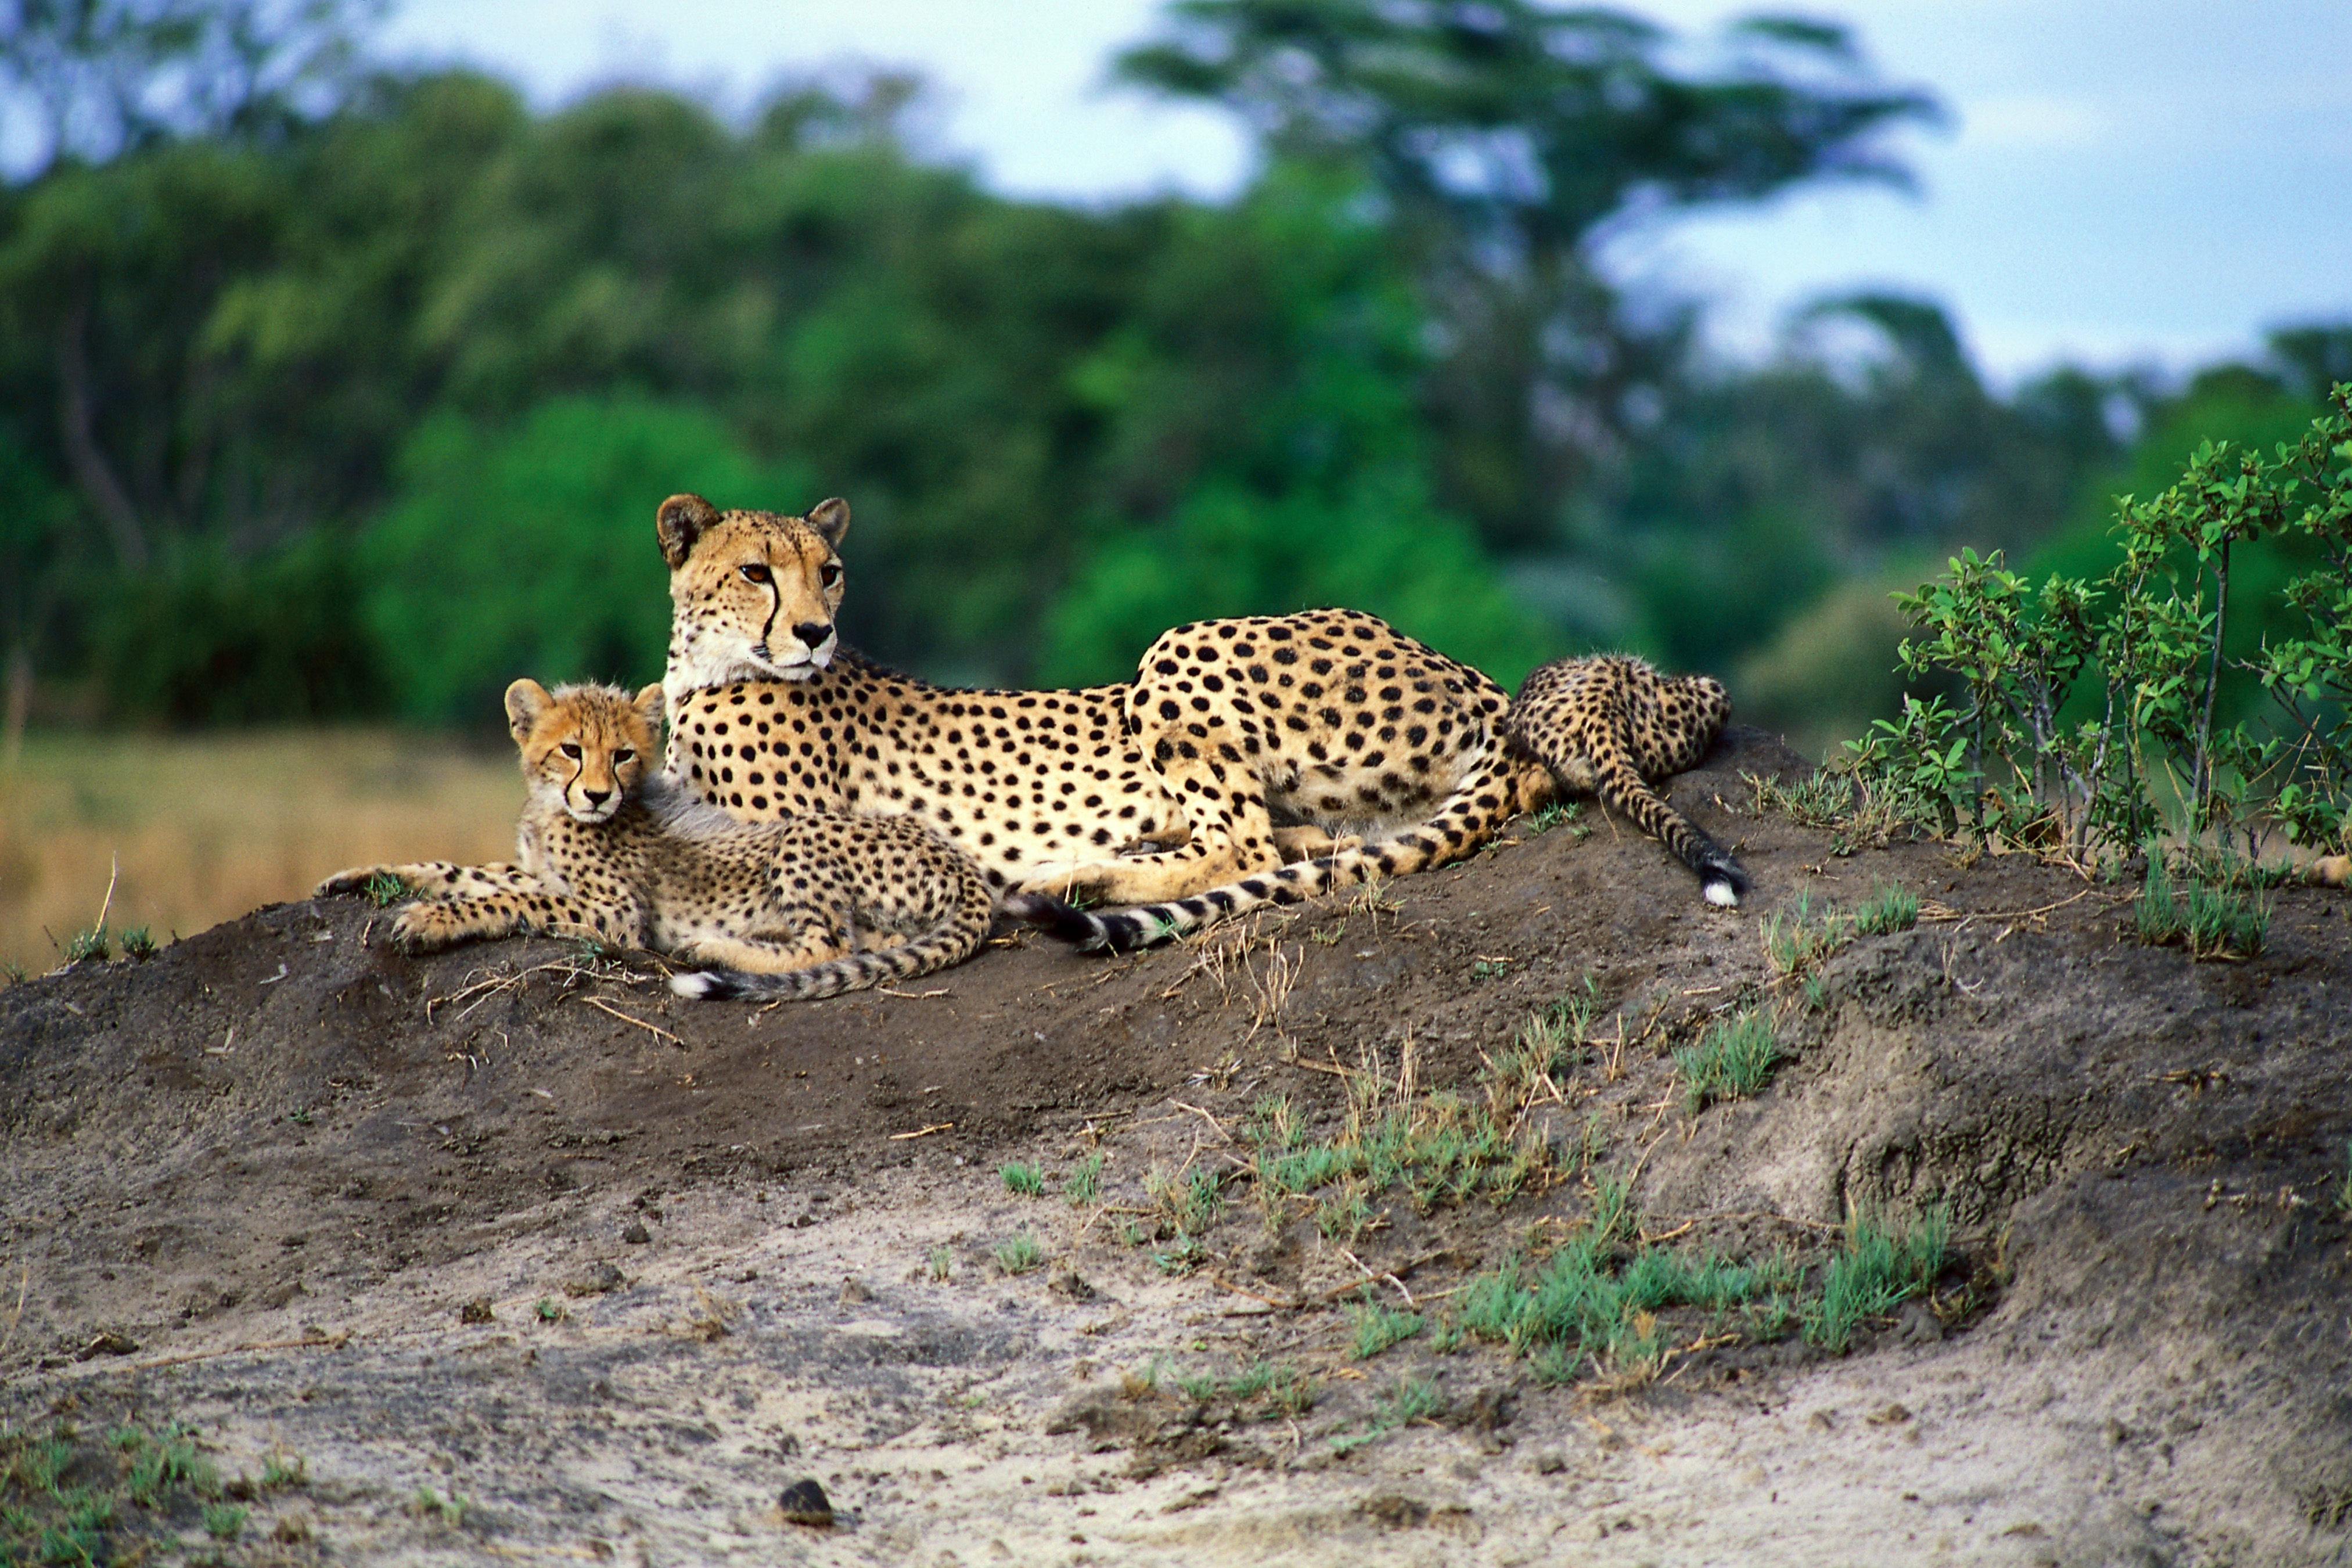 Africa Wildlife conservation, africa safari guide, travel africa, luxury safari tours, luxury Africa tours